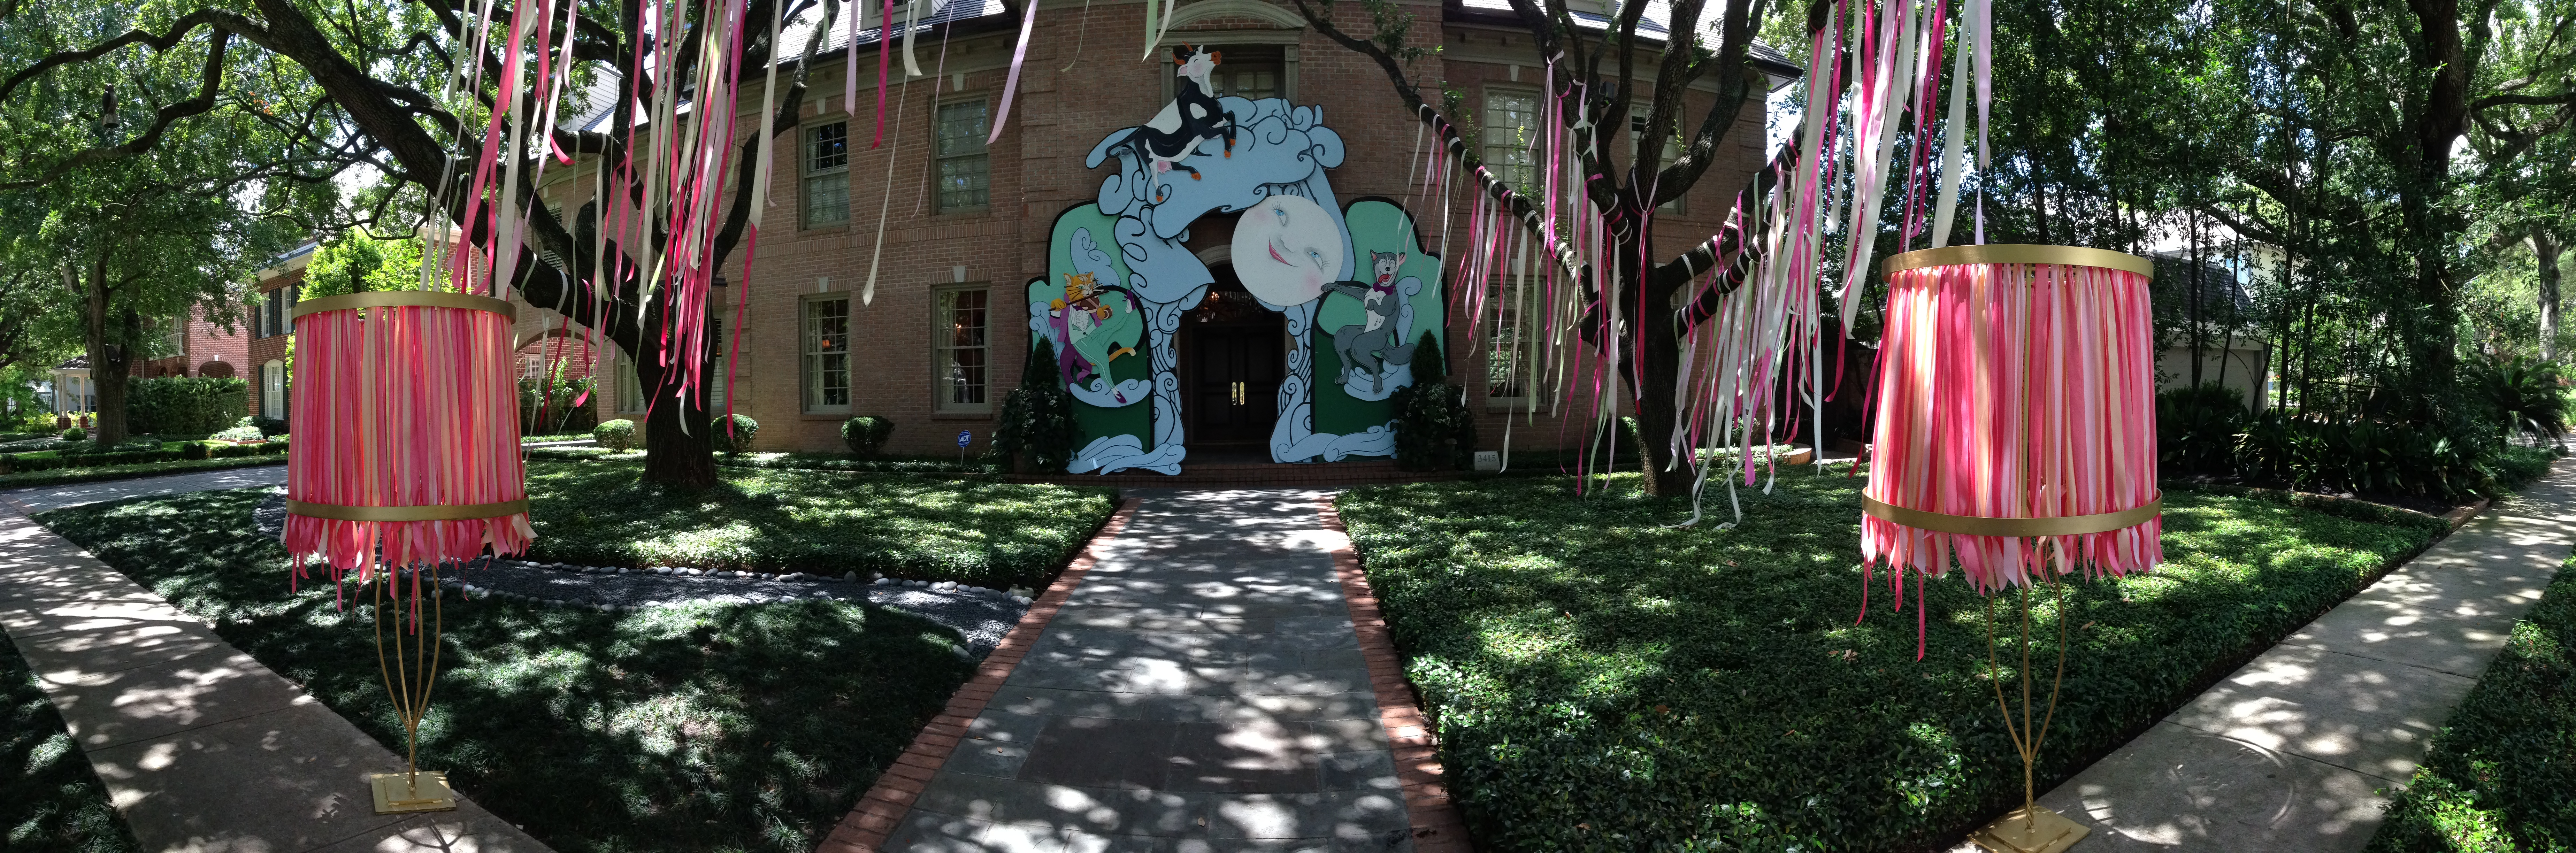 Nursery Rhyme Entrance